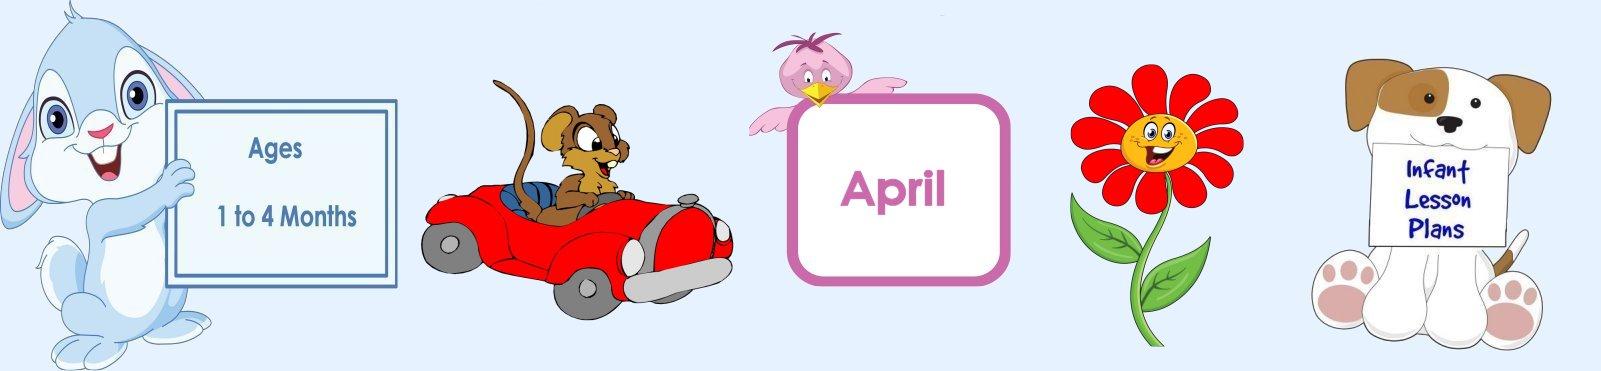 April Infant Lesson Plans 1 to 4 Months Old